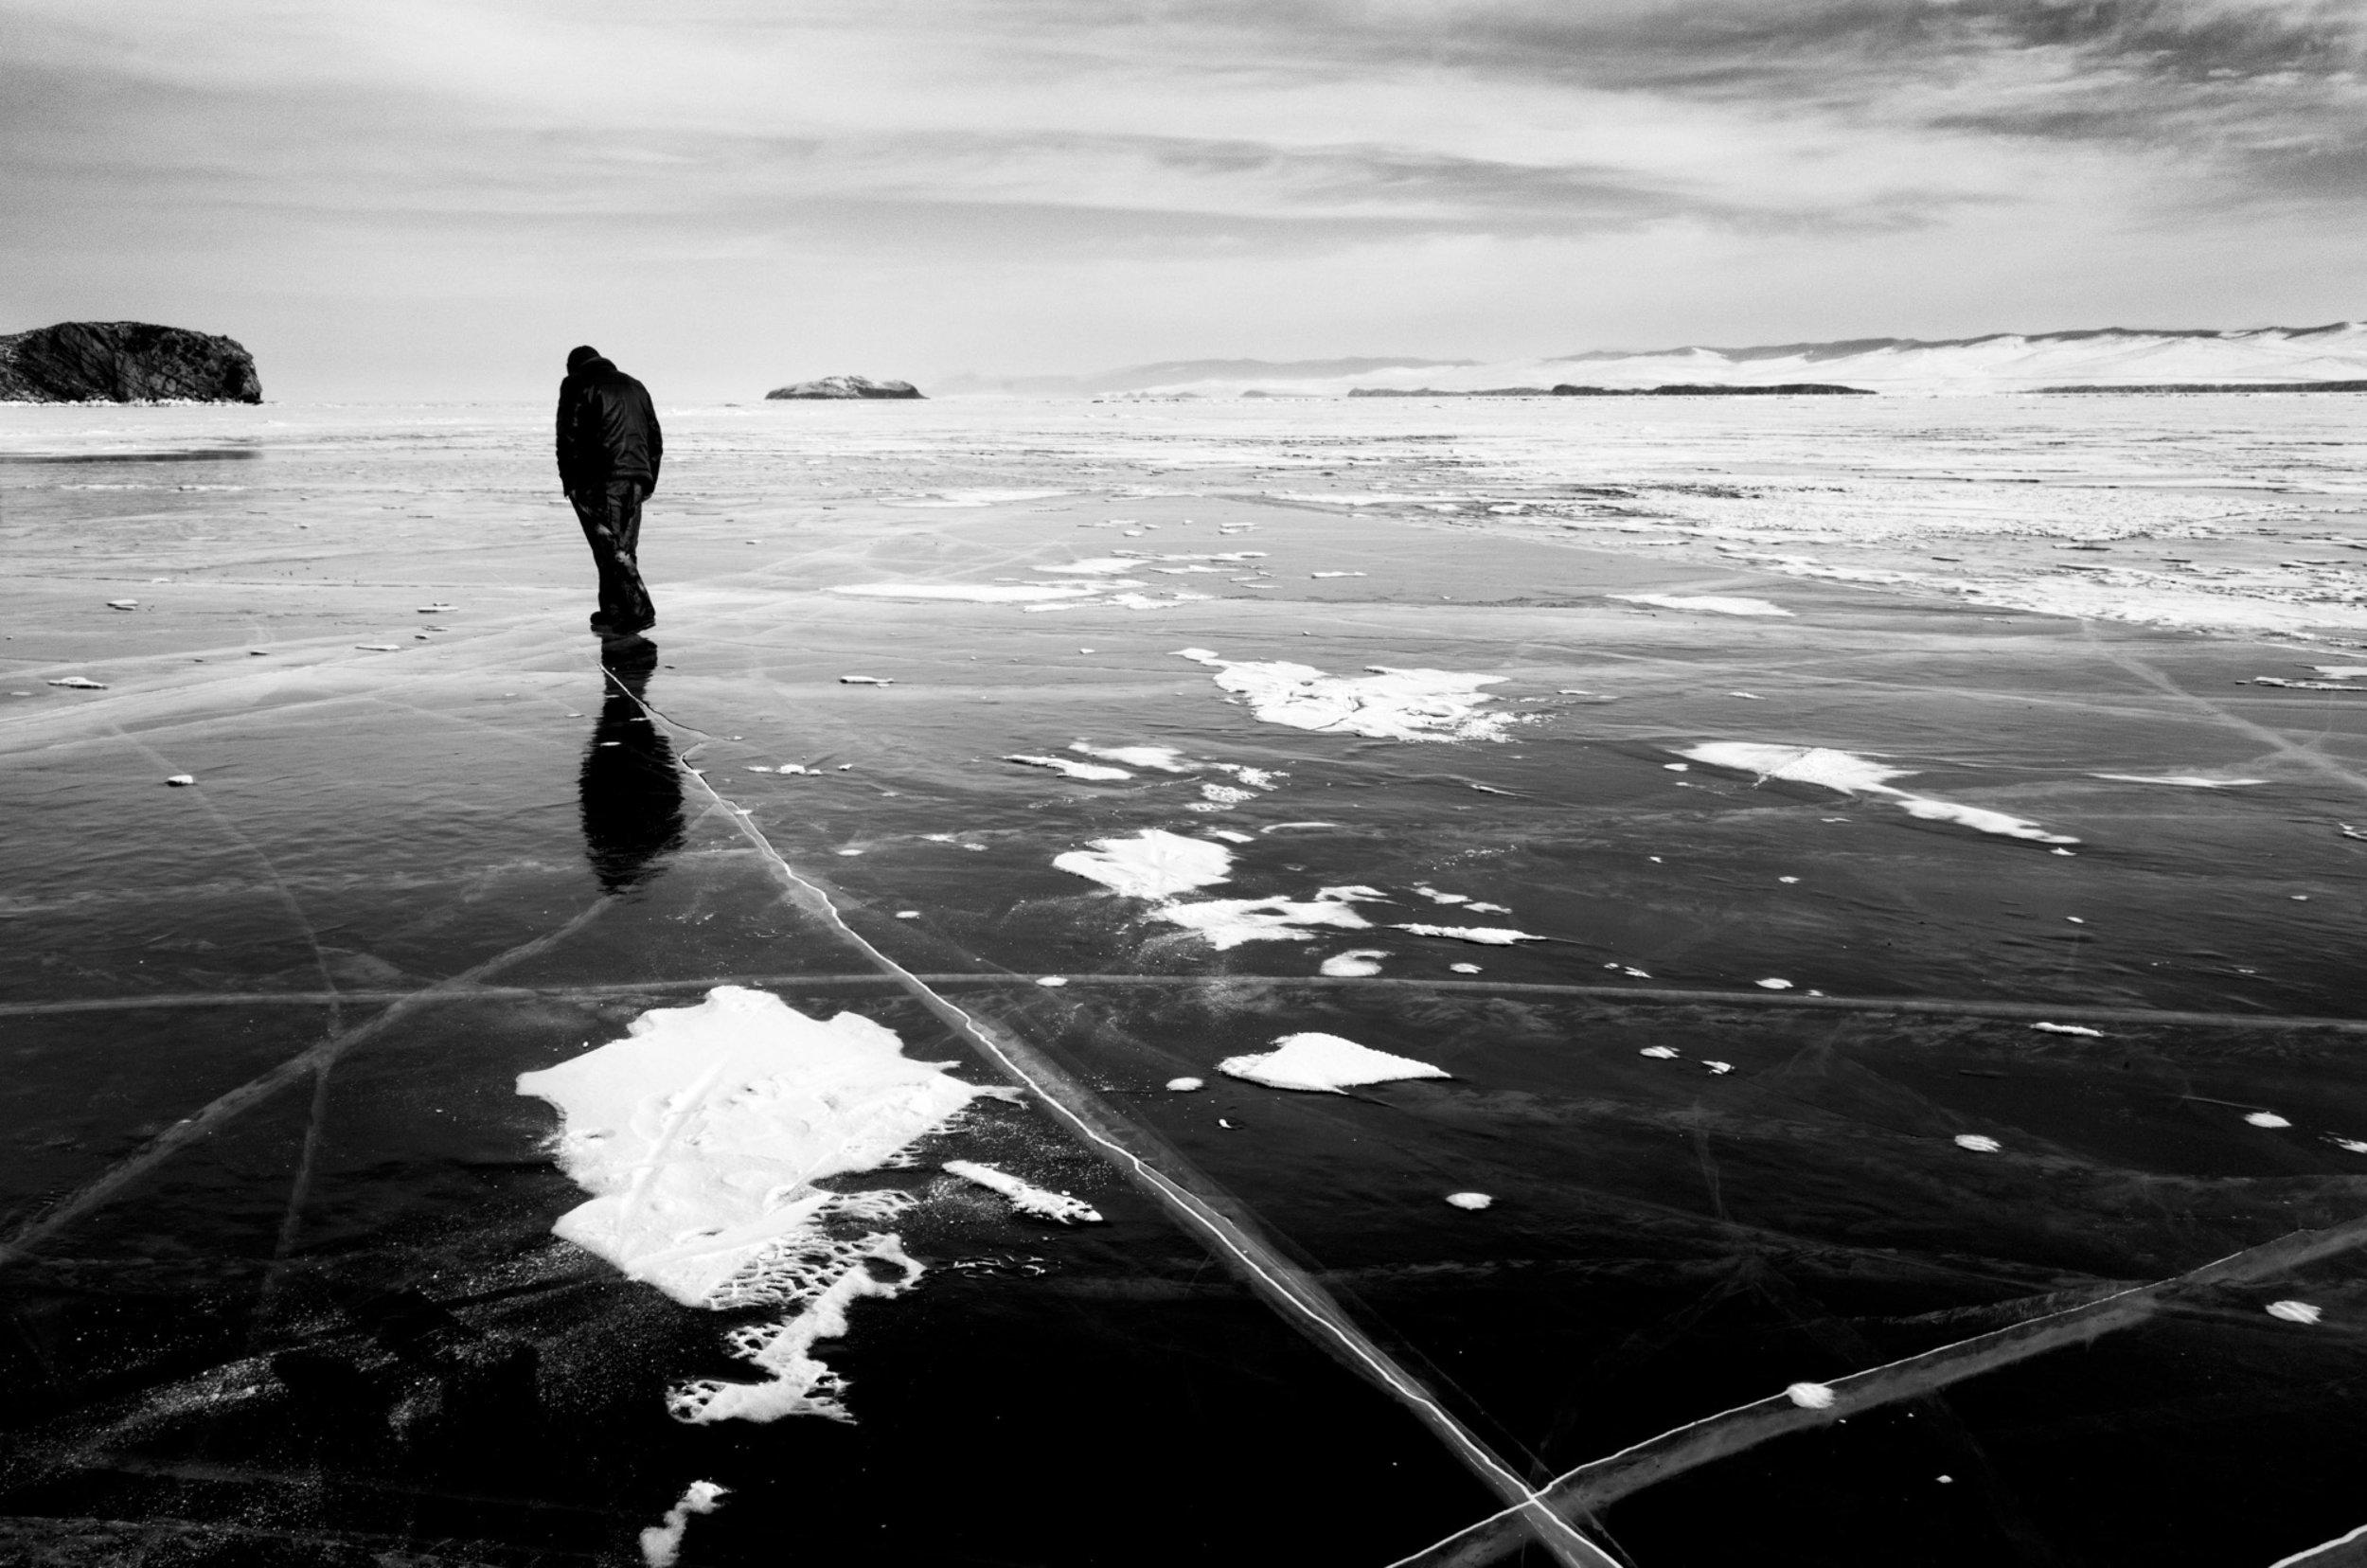 Baïkal Lake, Russia (2017) - 14 x 21 pulgadas- Edición de 7, Impresión en gelatina de plata / Silver print